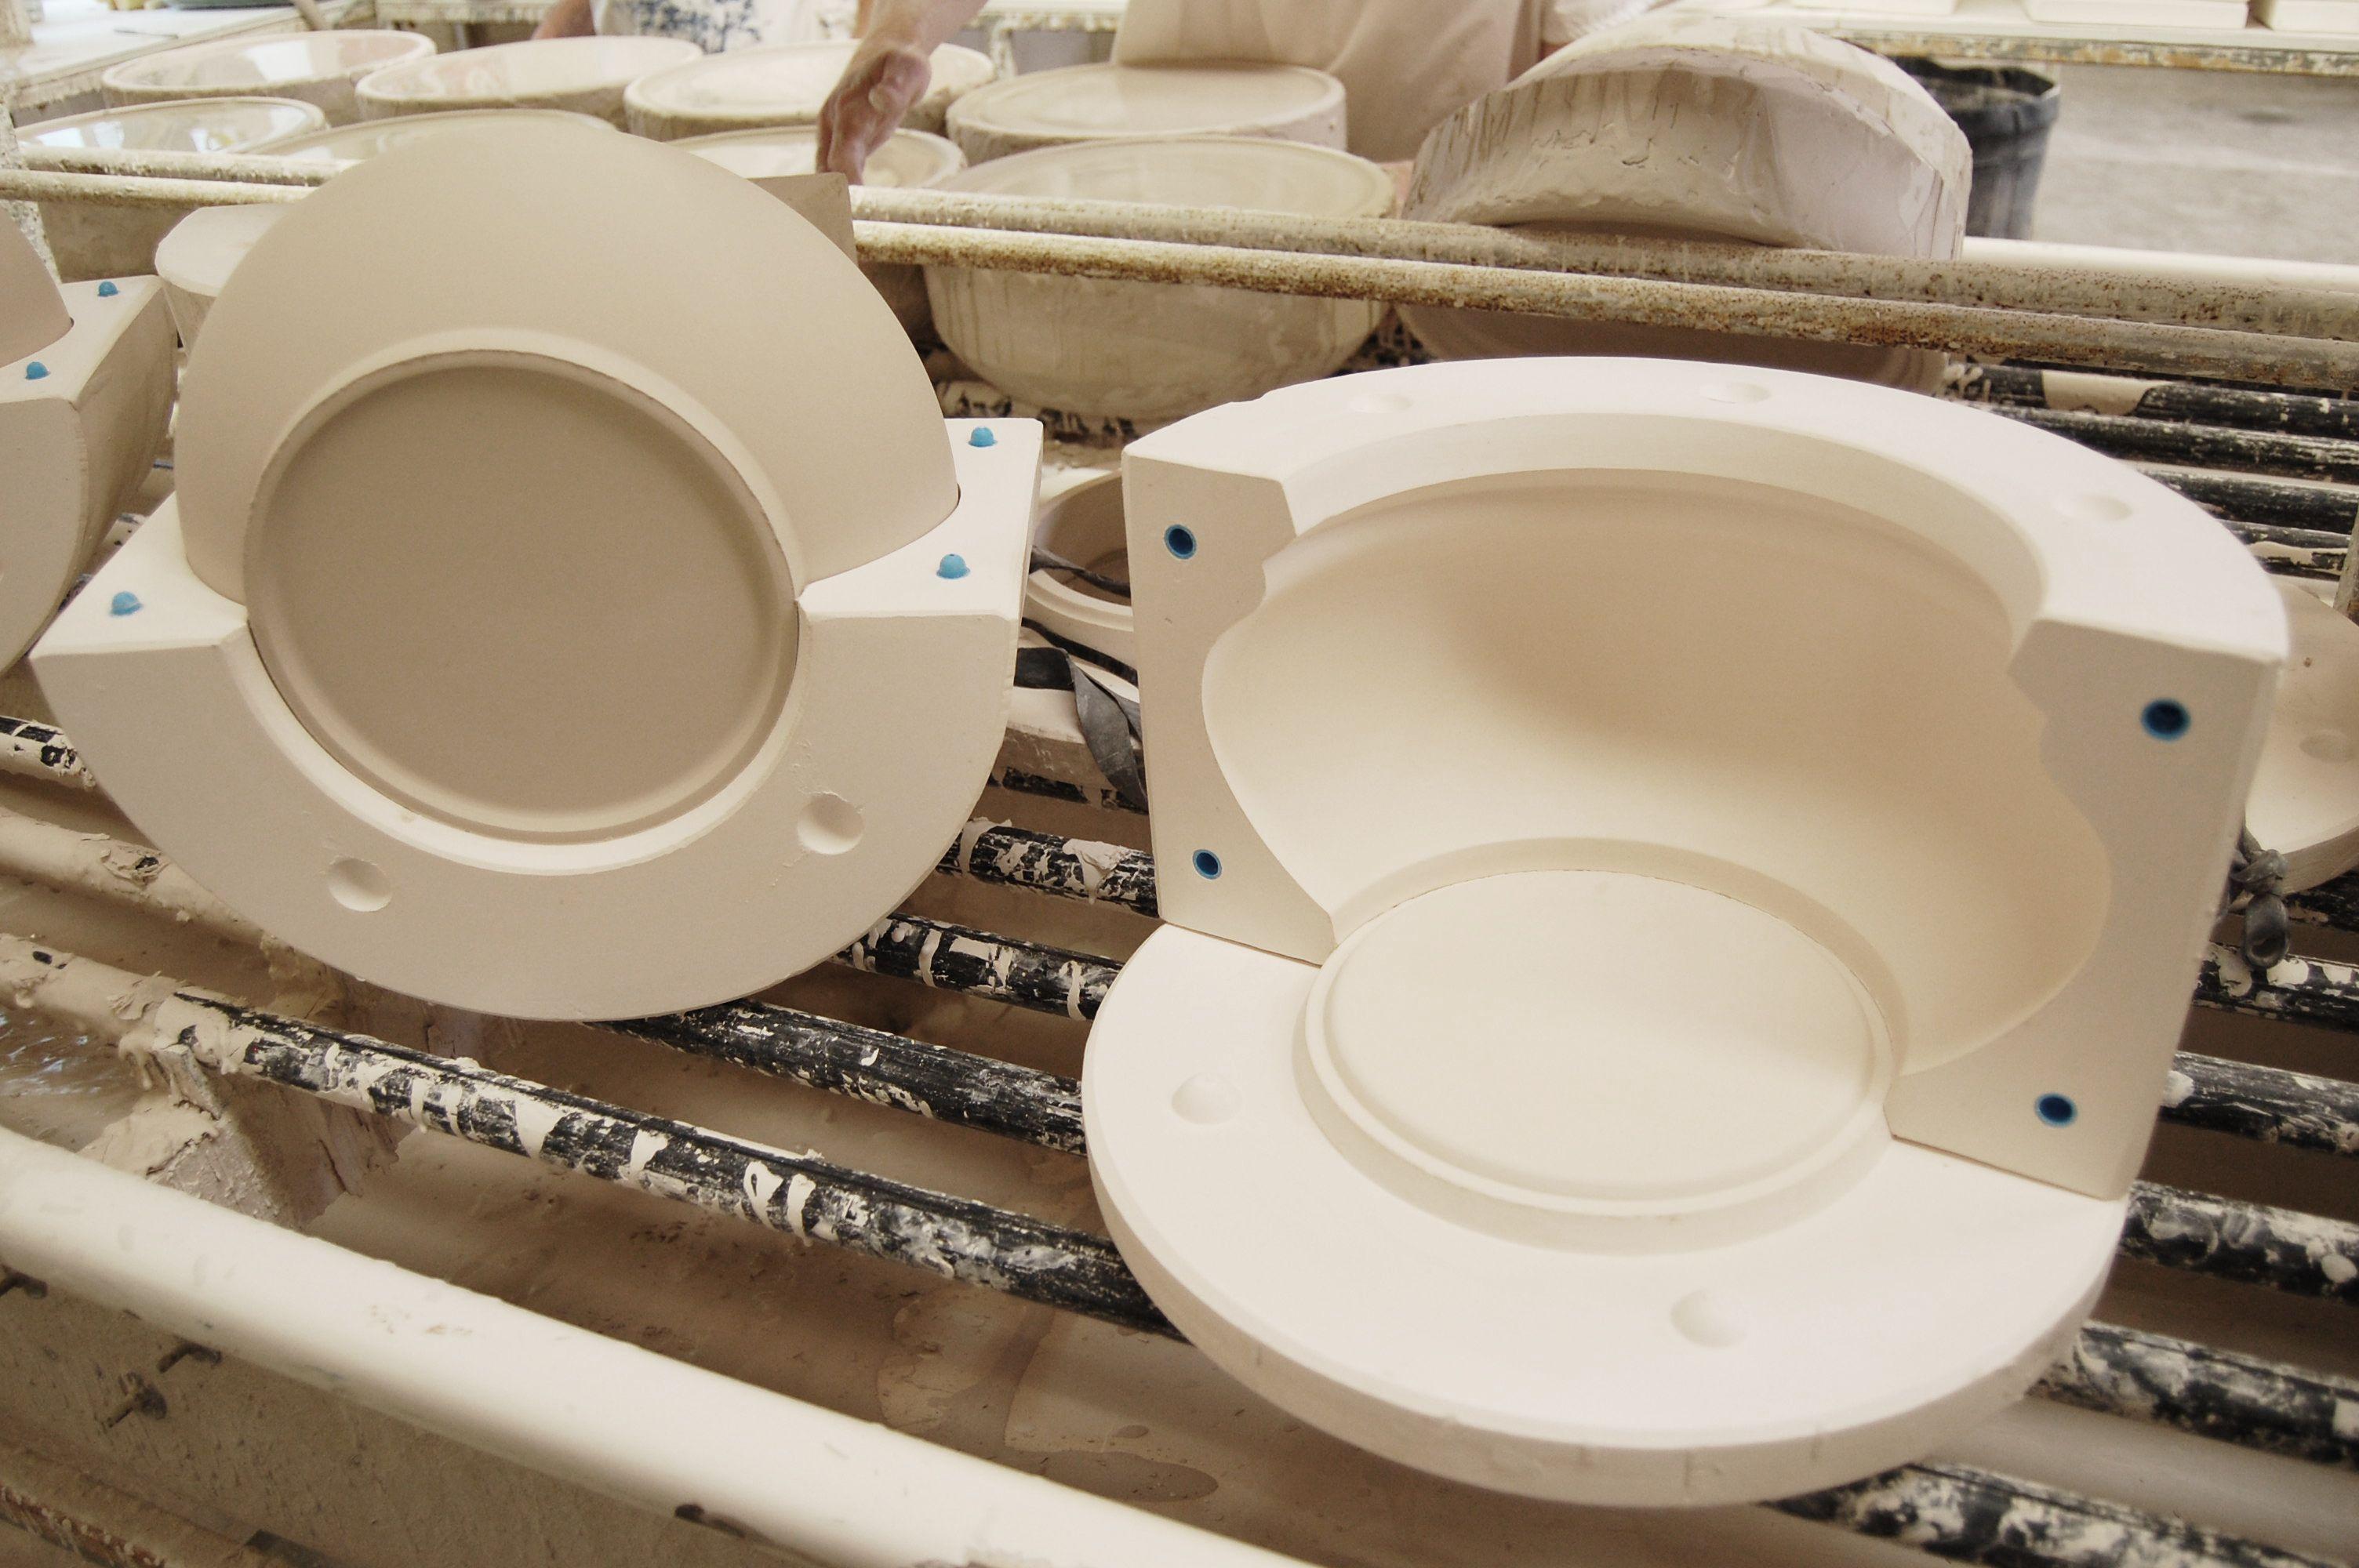 Demoulding A Slip Cast Plaster Molds Ceramic Molds Pottery Molds